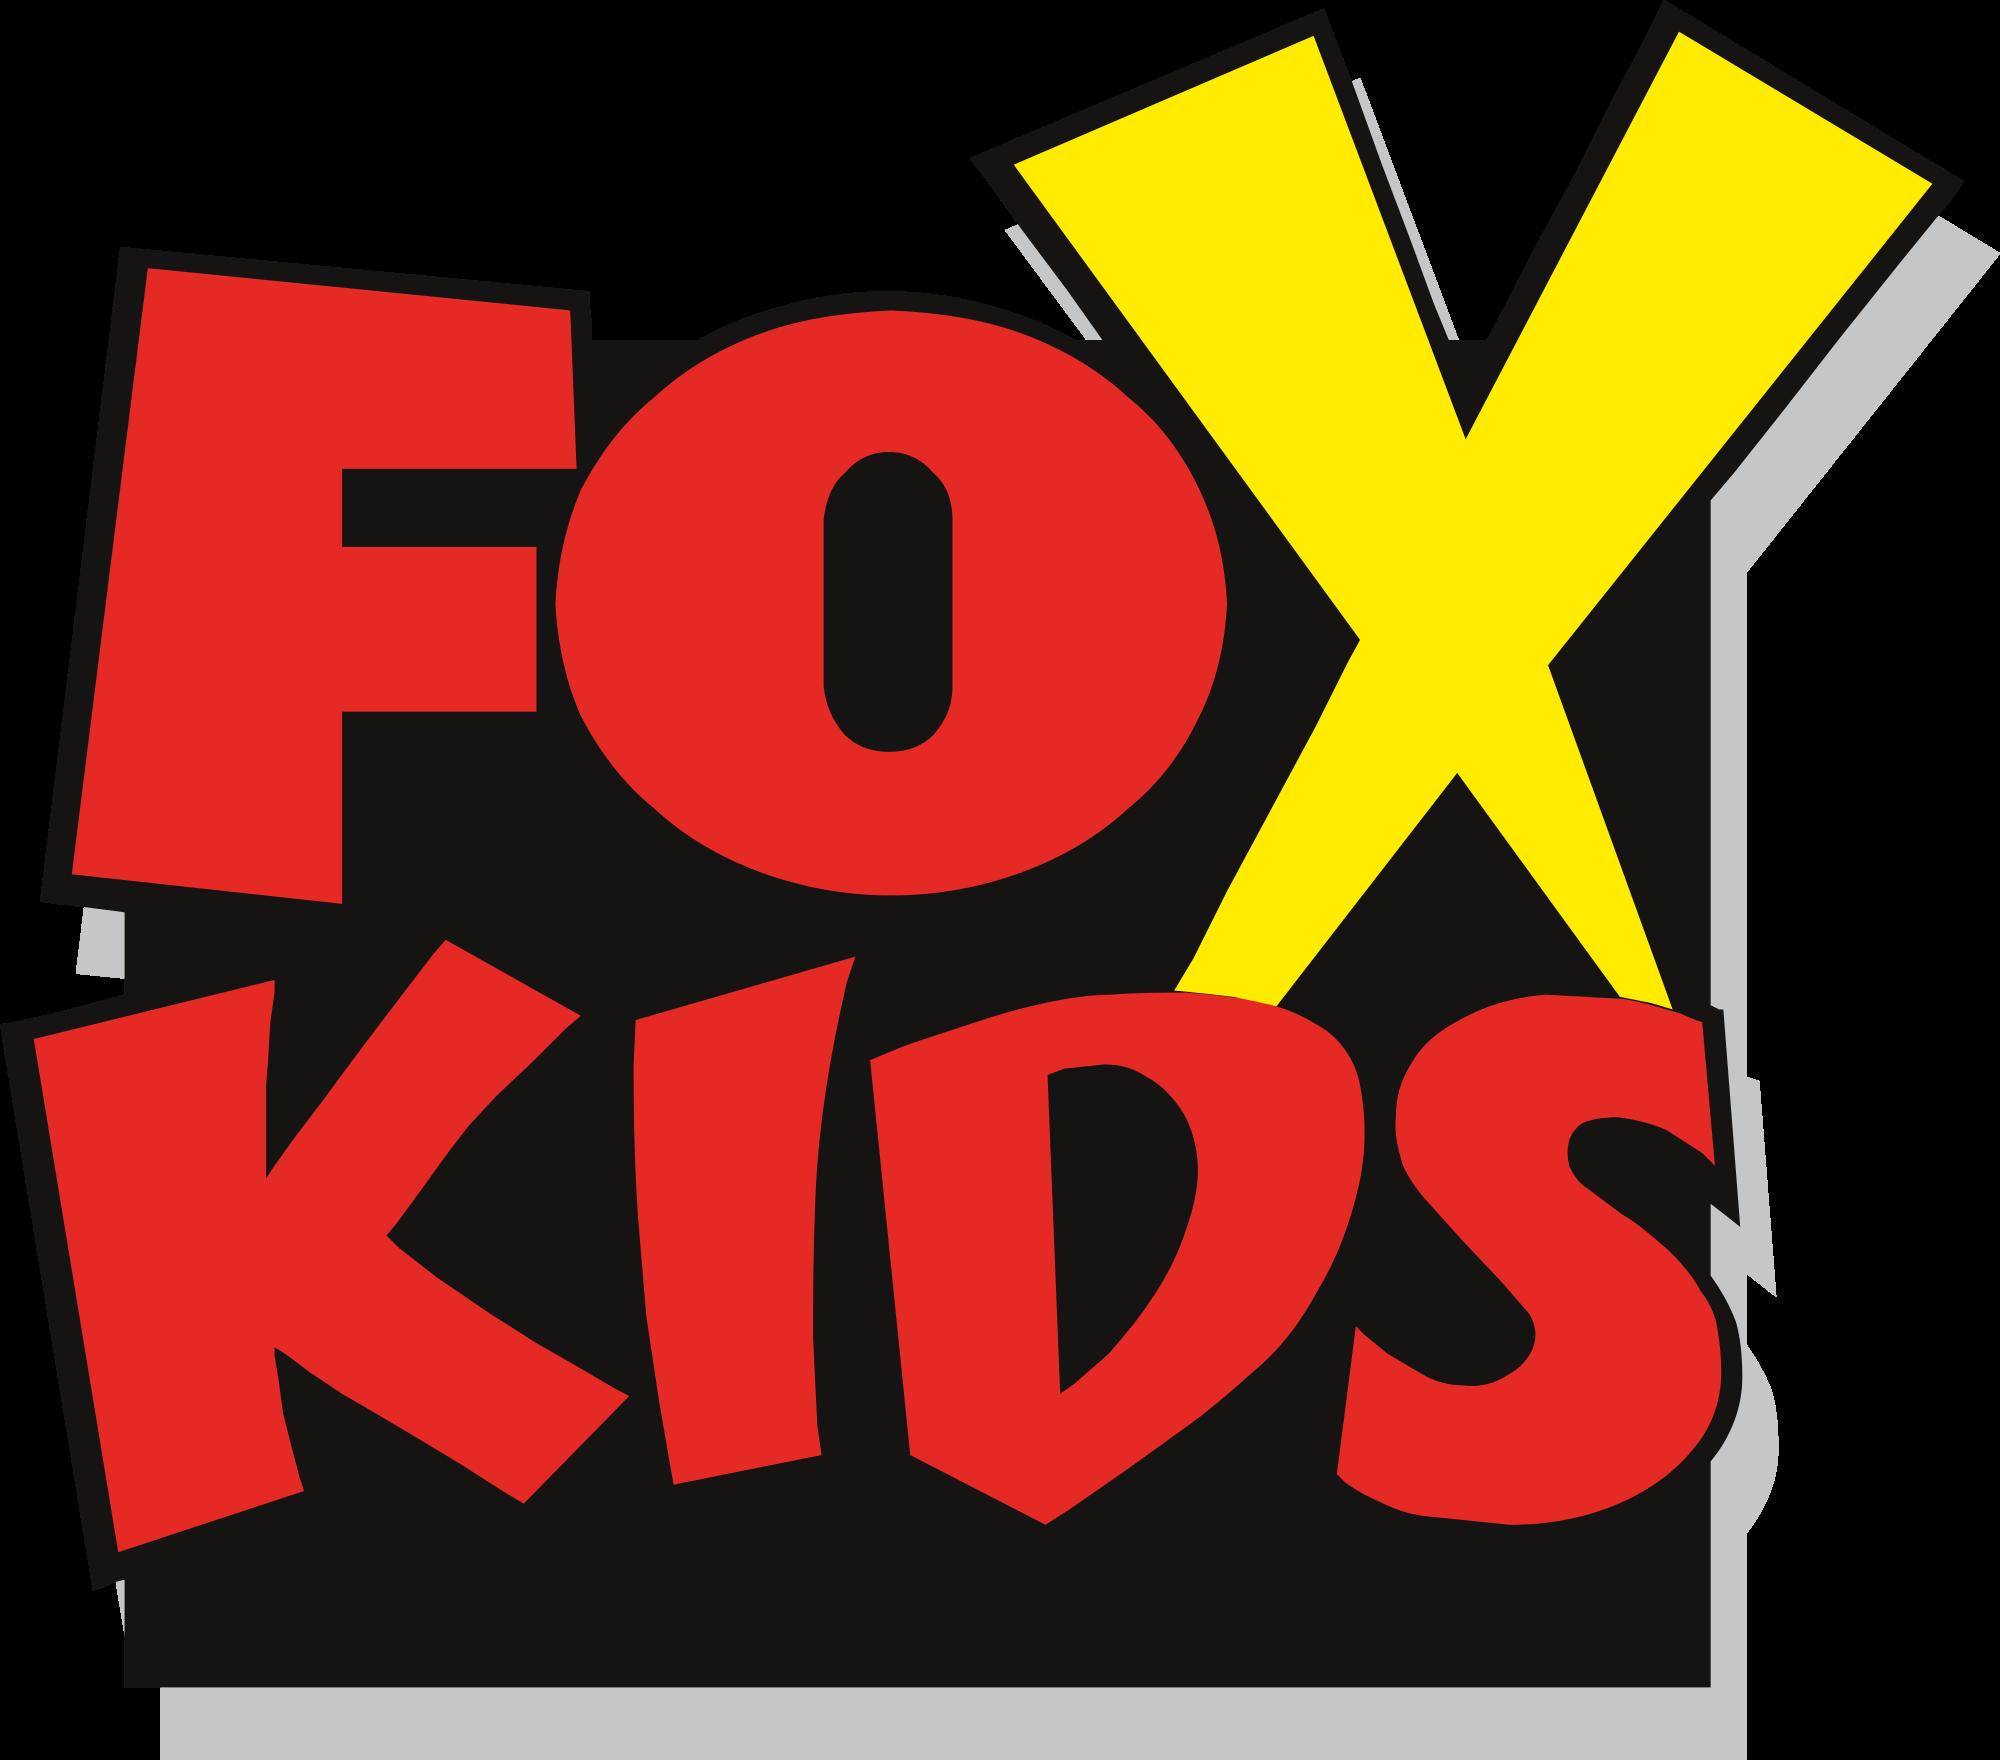 Fox Kids Wikipedia, the free encyclopedia Fox kids